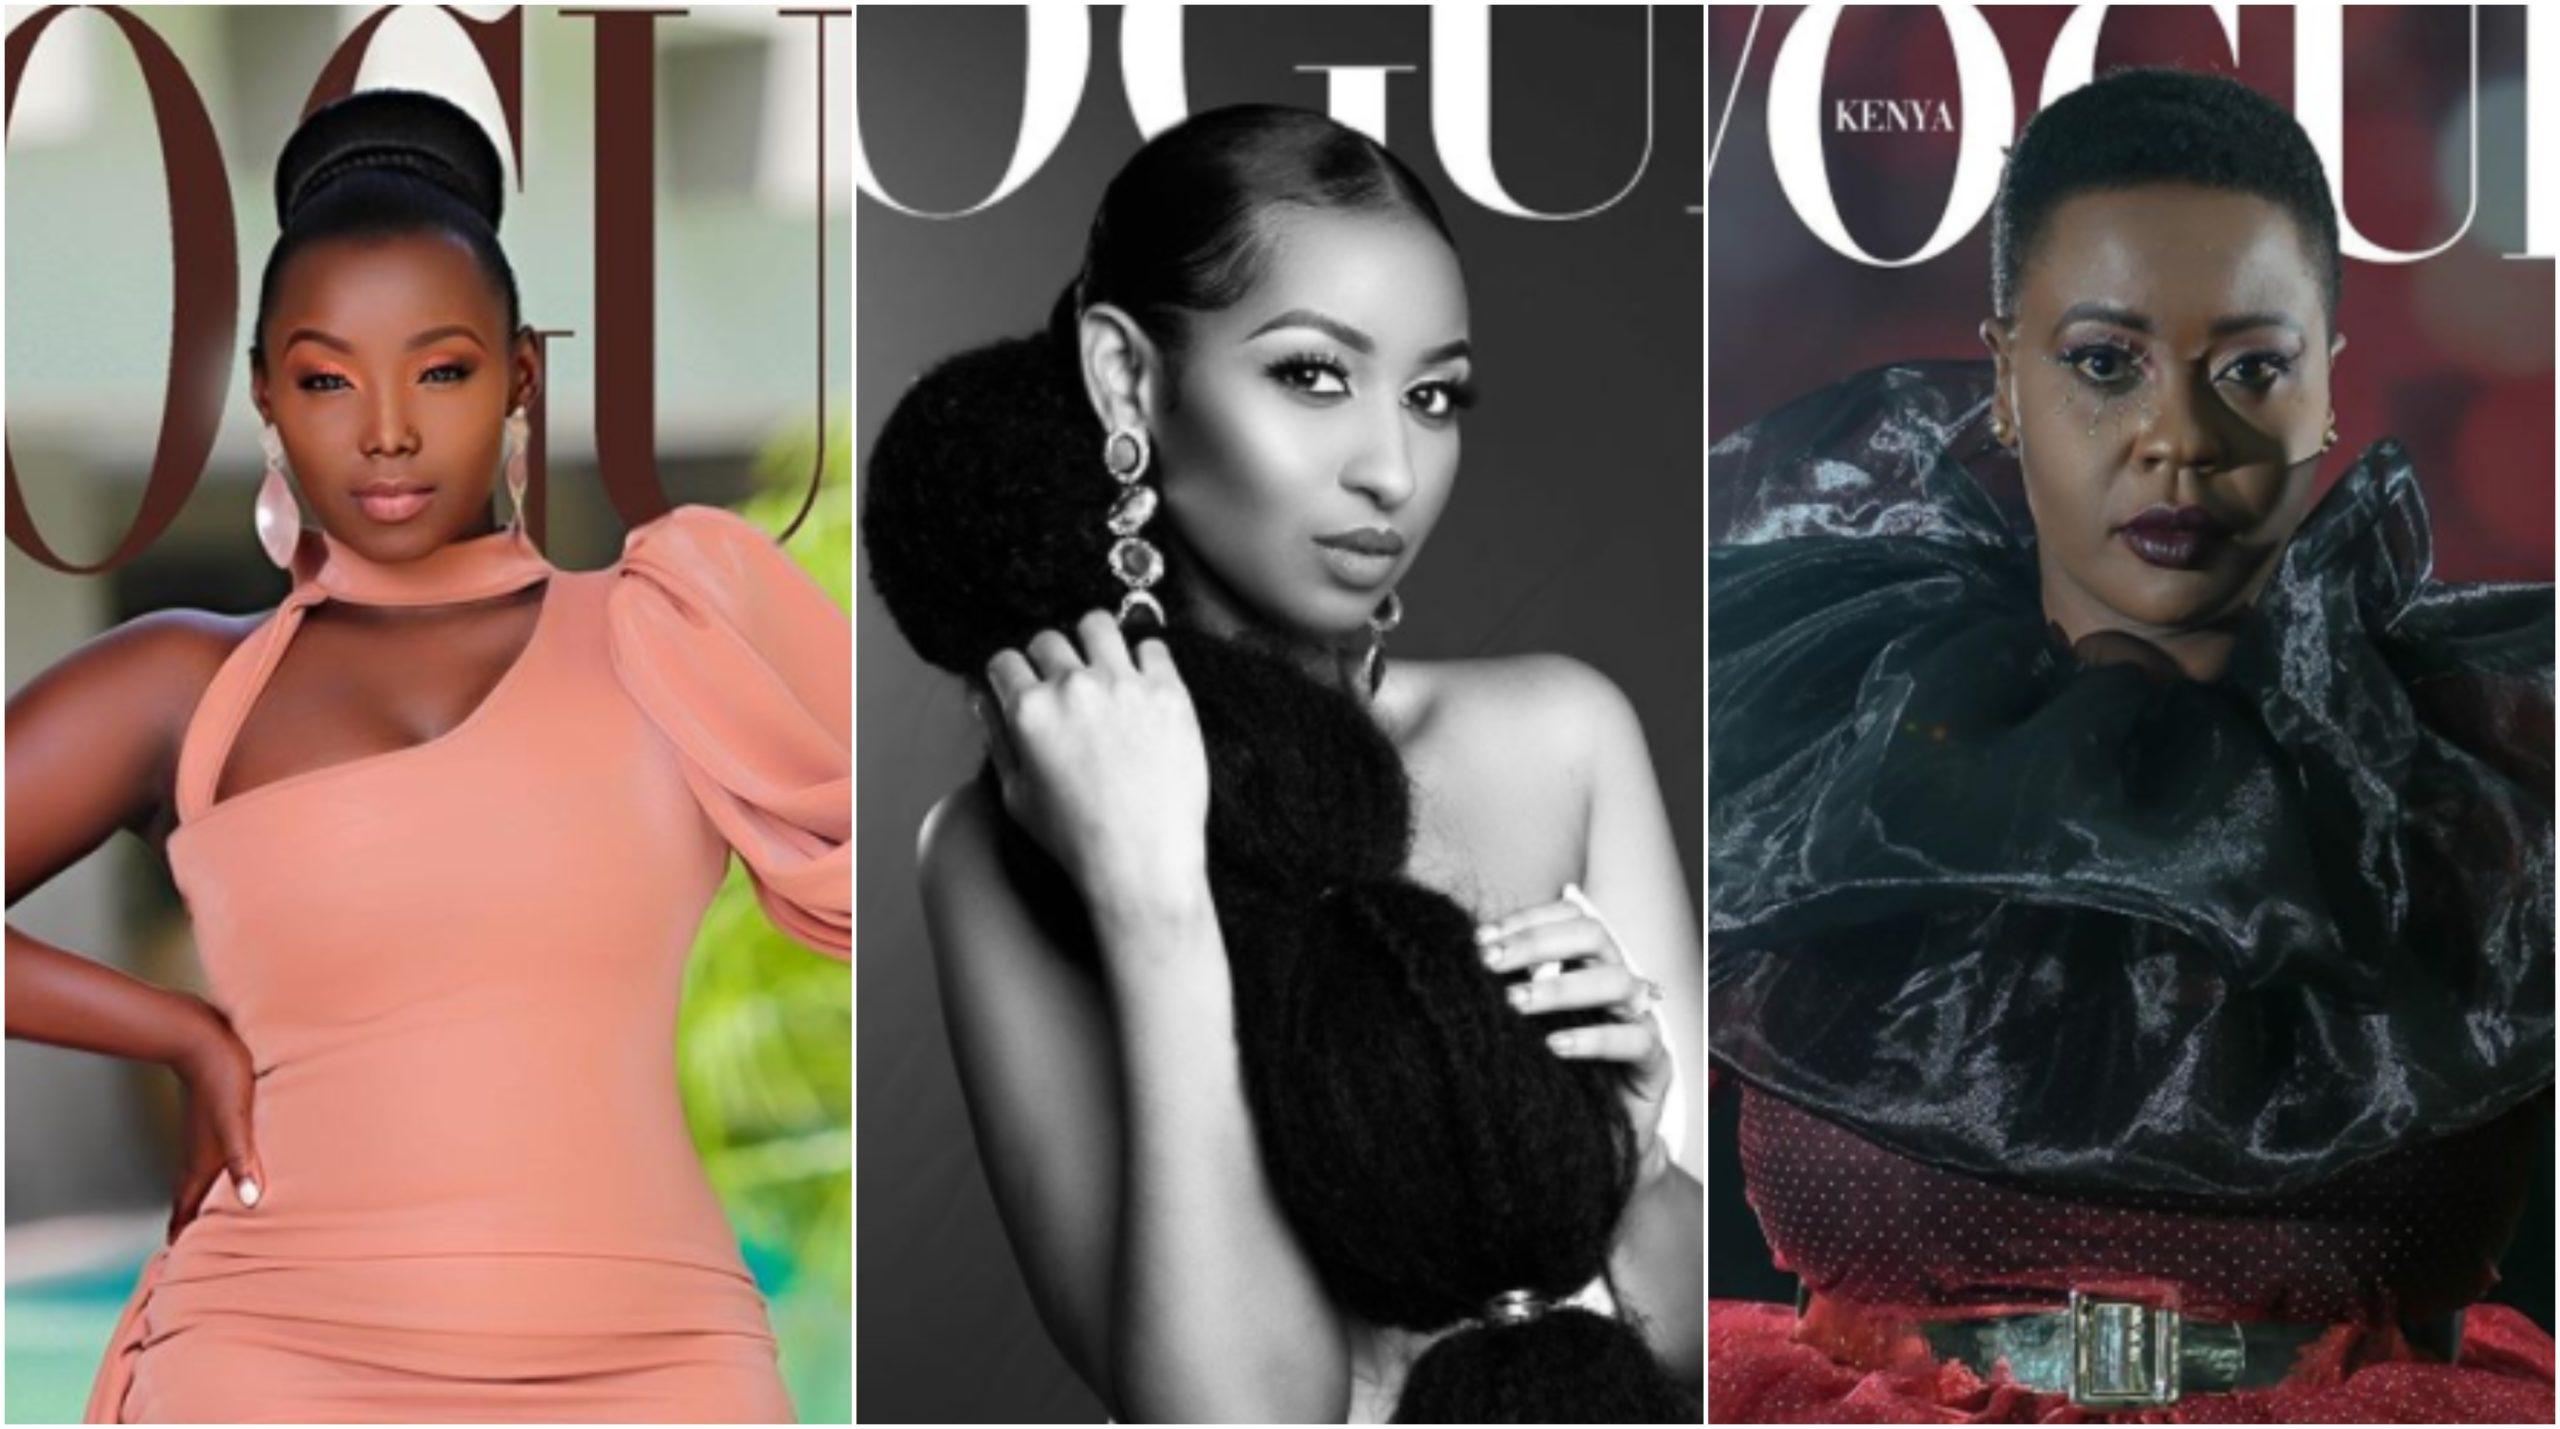 Kenyan female celebrity featured on CNN after unique Vogue challenge (Photos)